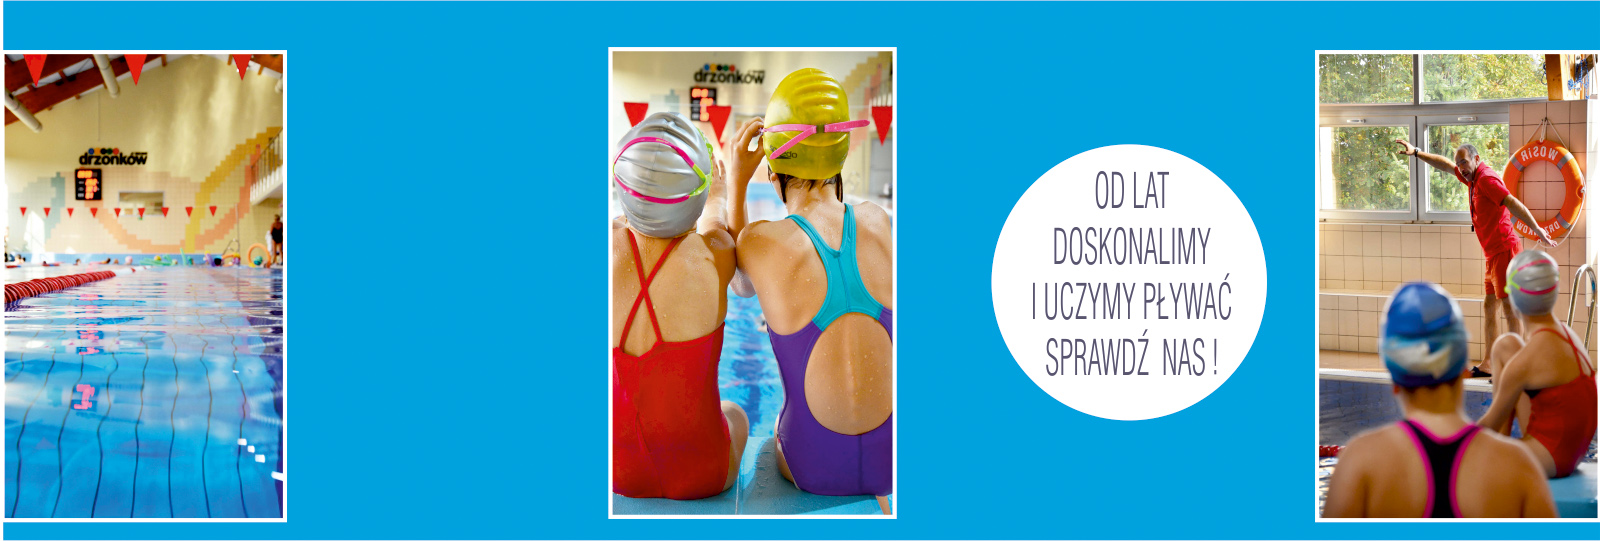 Baner: nauki pływania